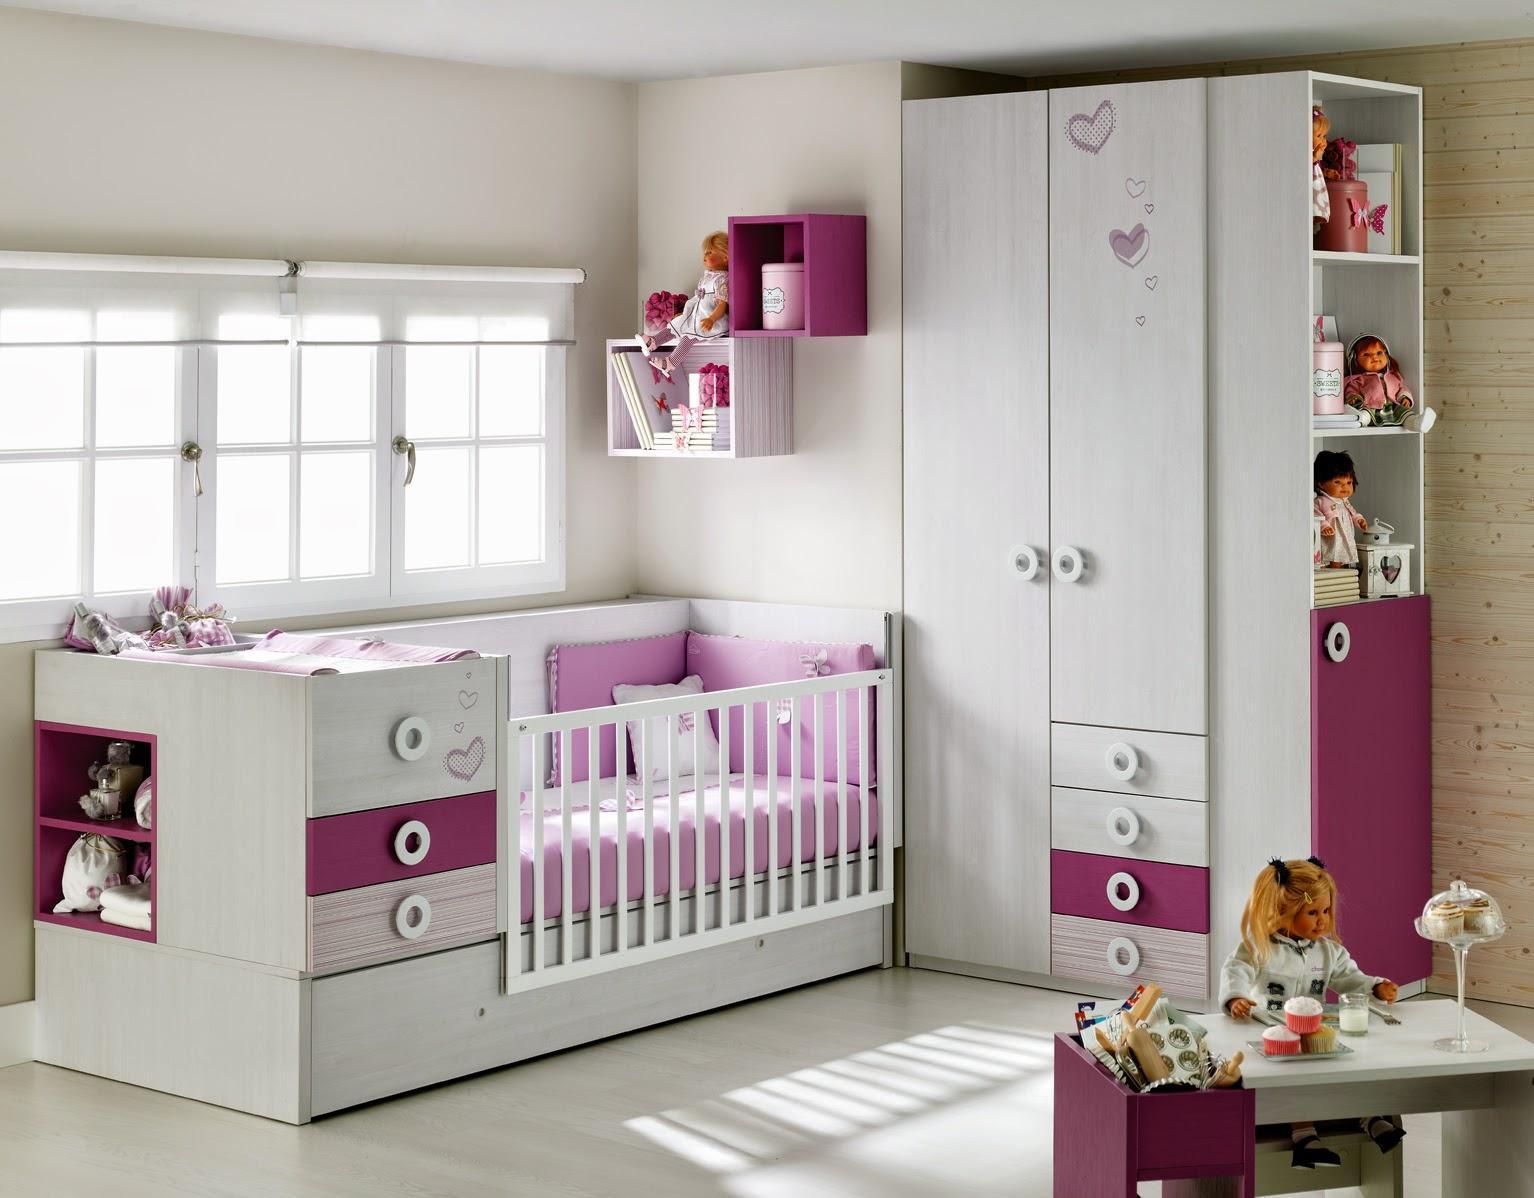 Culle per neonati lettino trasformabile elegance - Habitaciones cuna convertible en cama ...